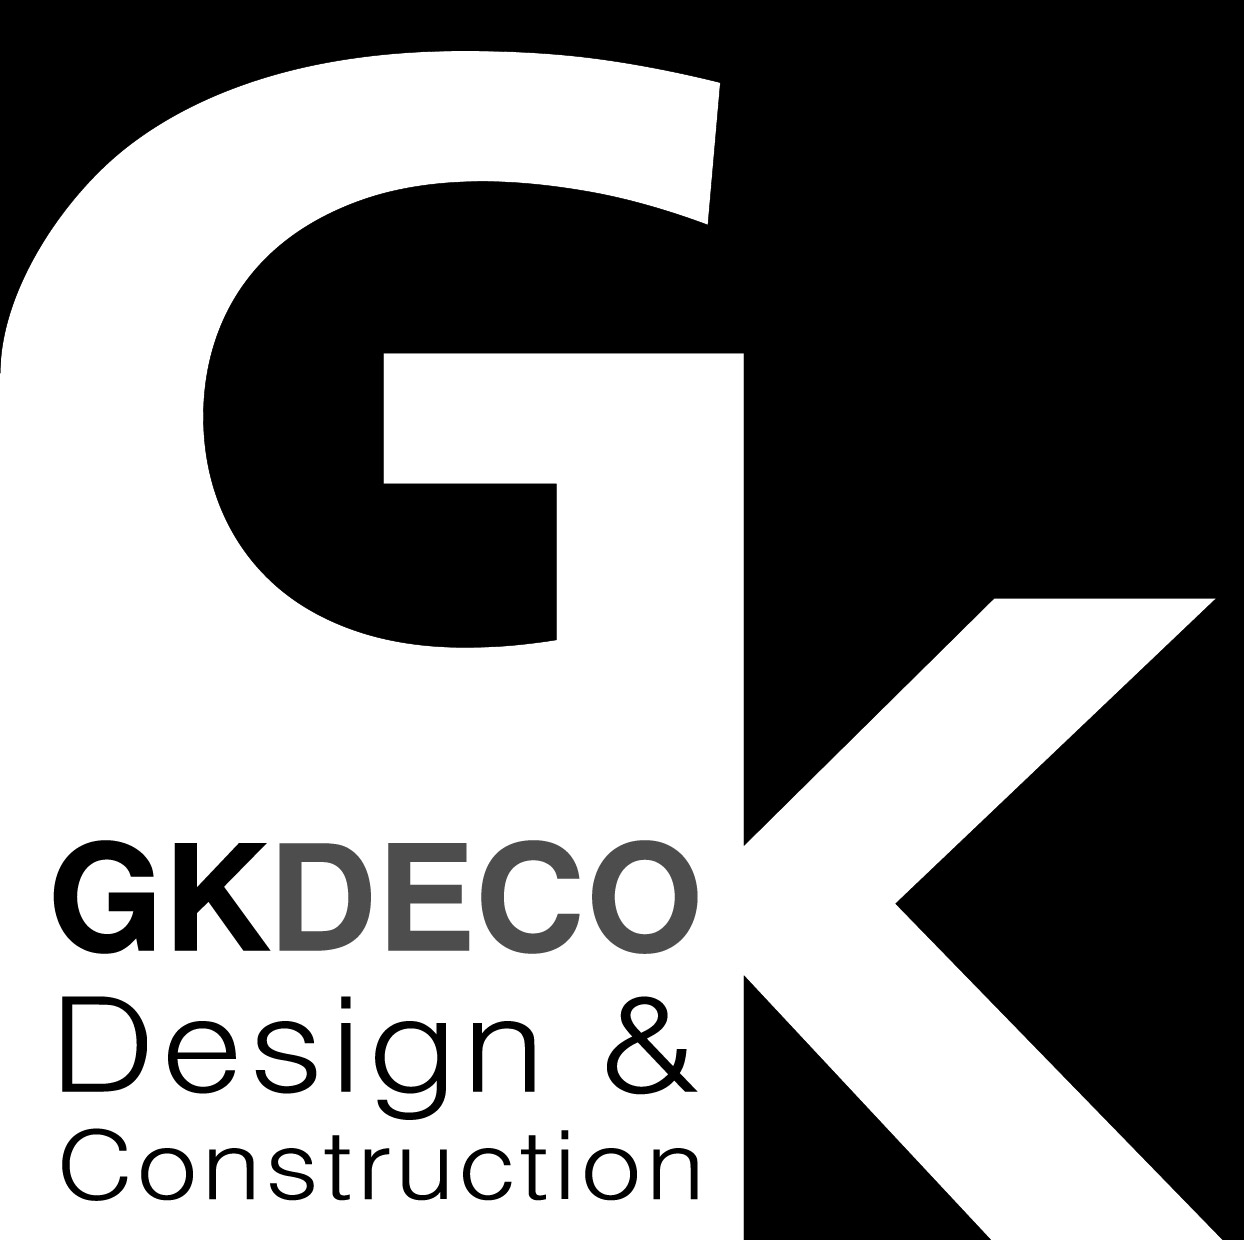 GK Decoration - Design & Construction